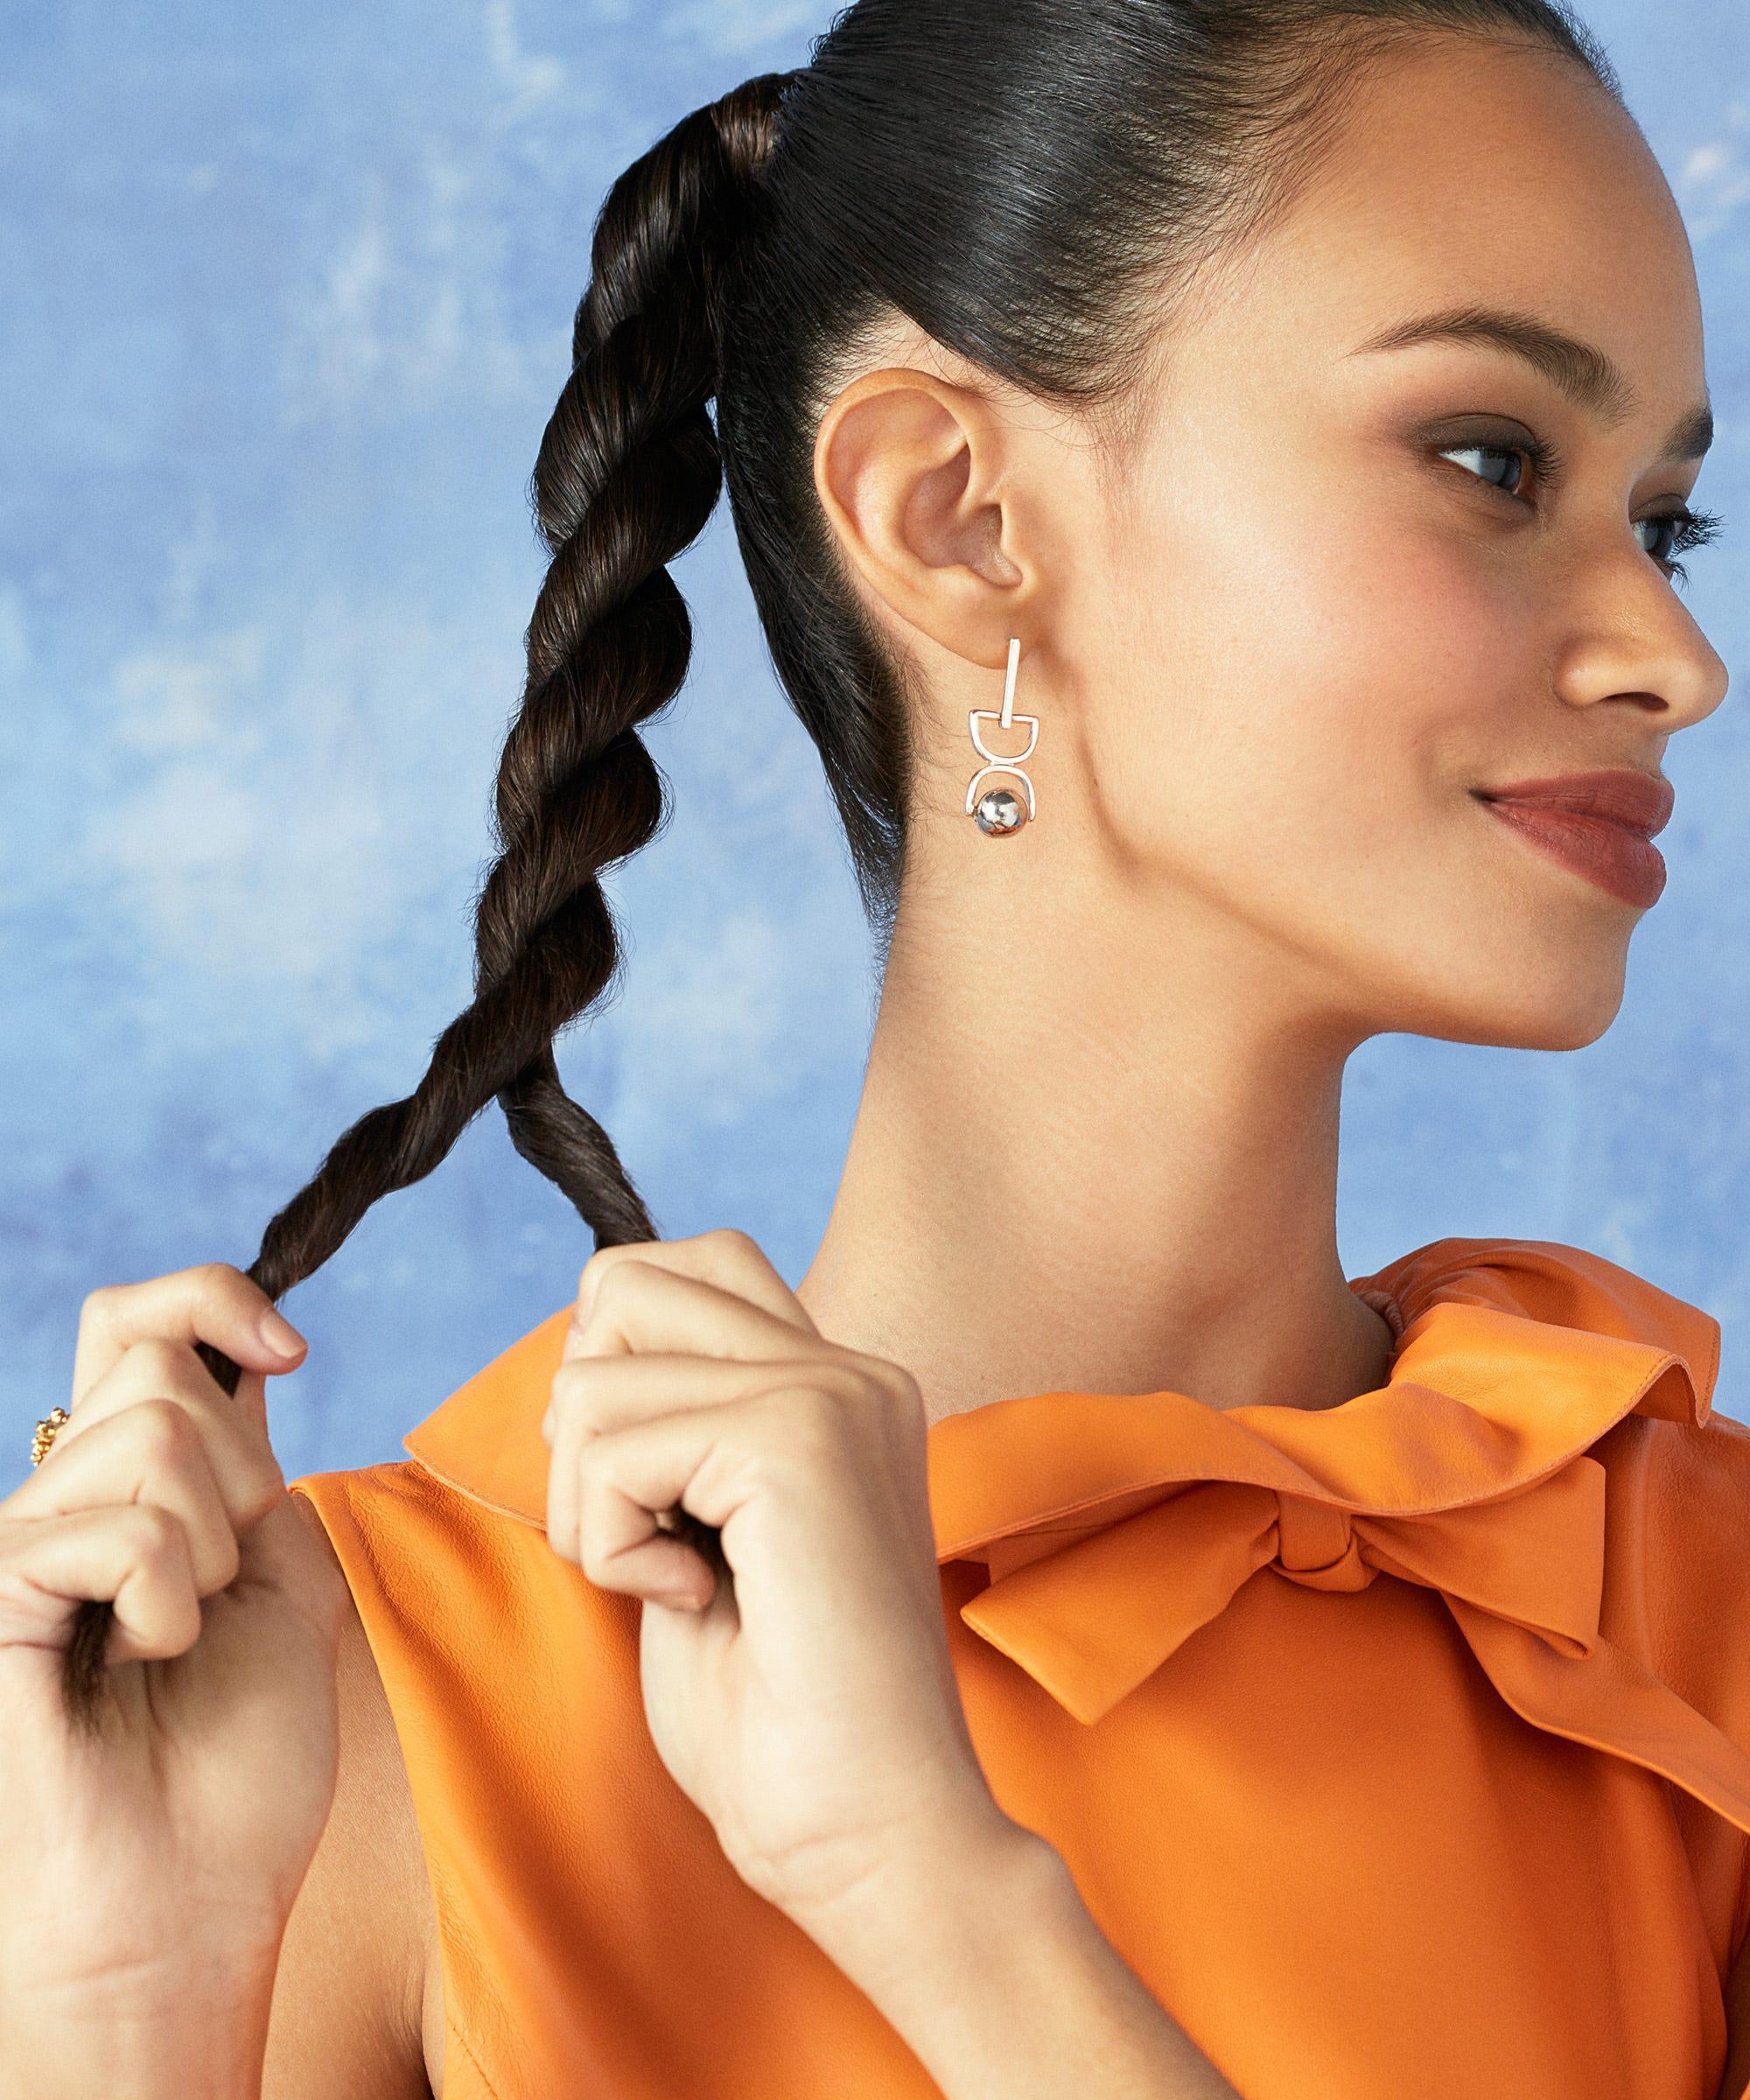 Peachy Professional Hairstyles At Home Easy Diy Hair Short Hairstyles For Black Women Fulllsitofus